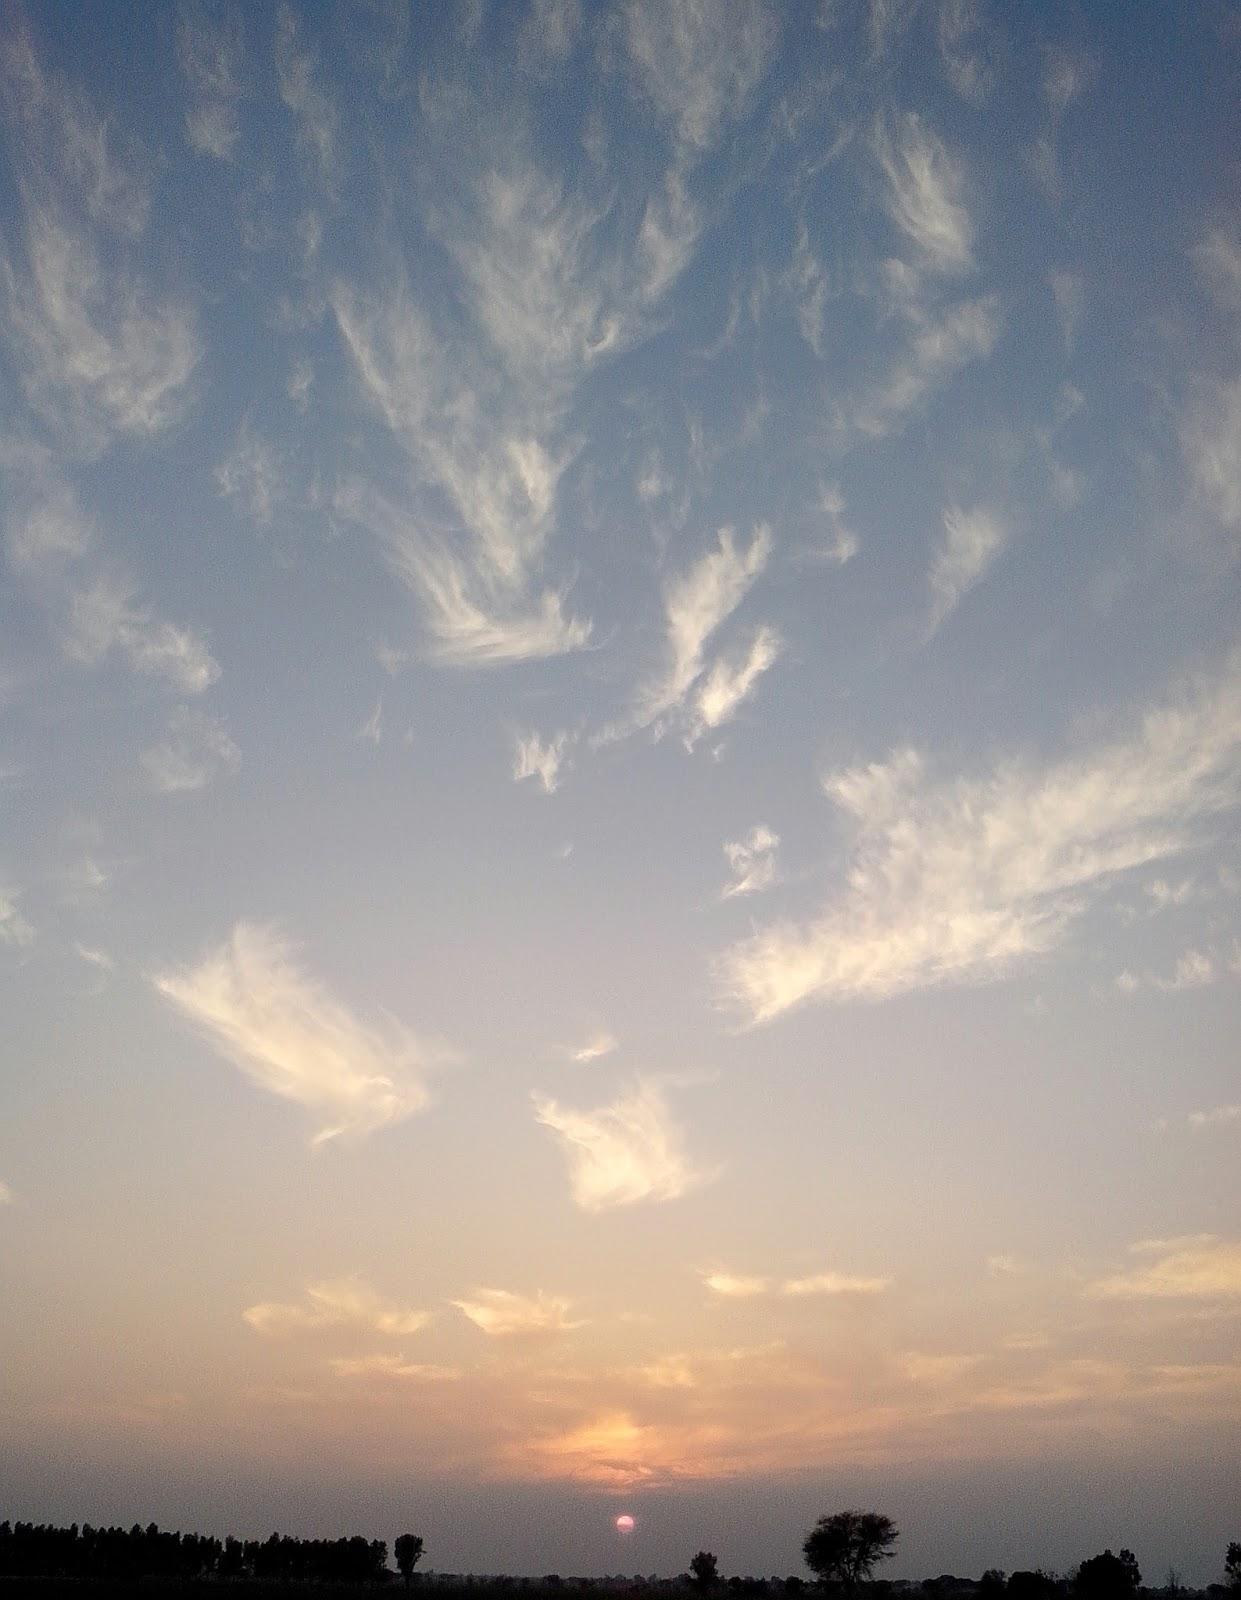 writings-in-sky-pakistan